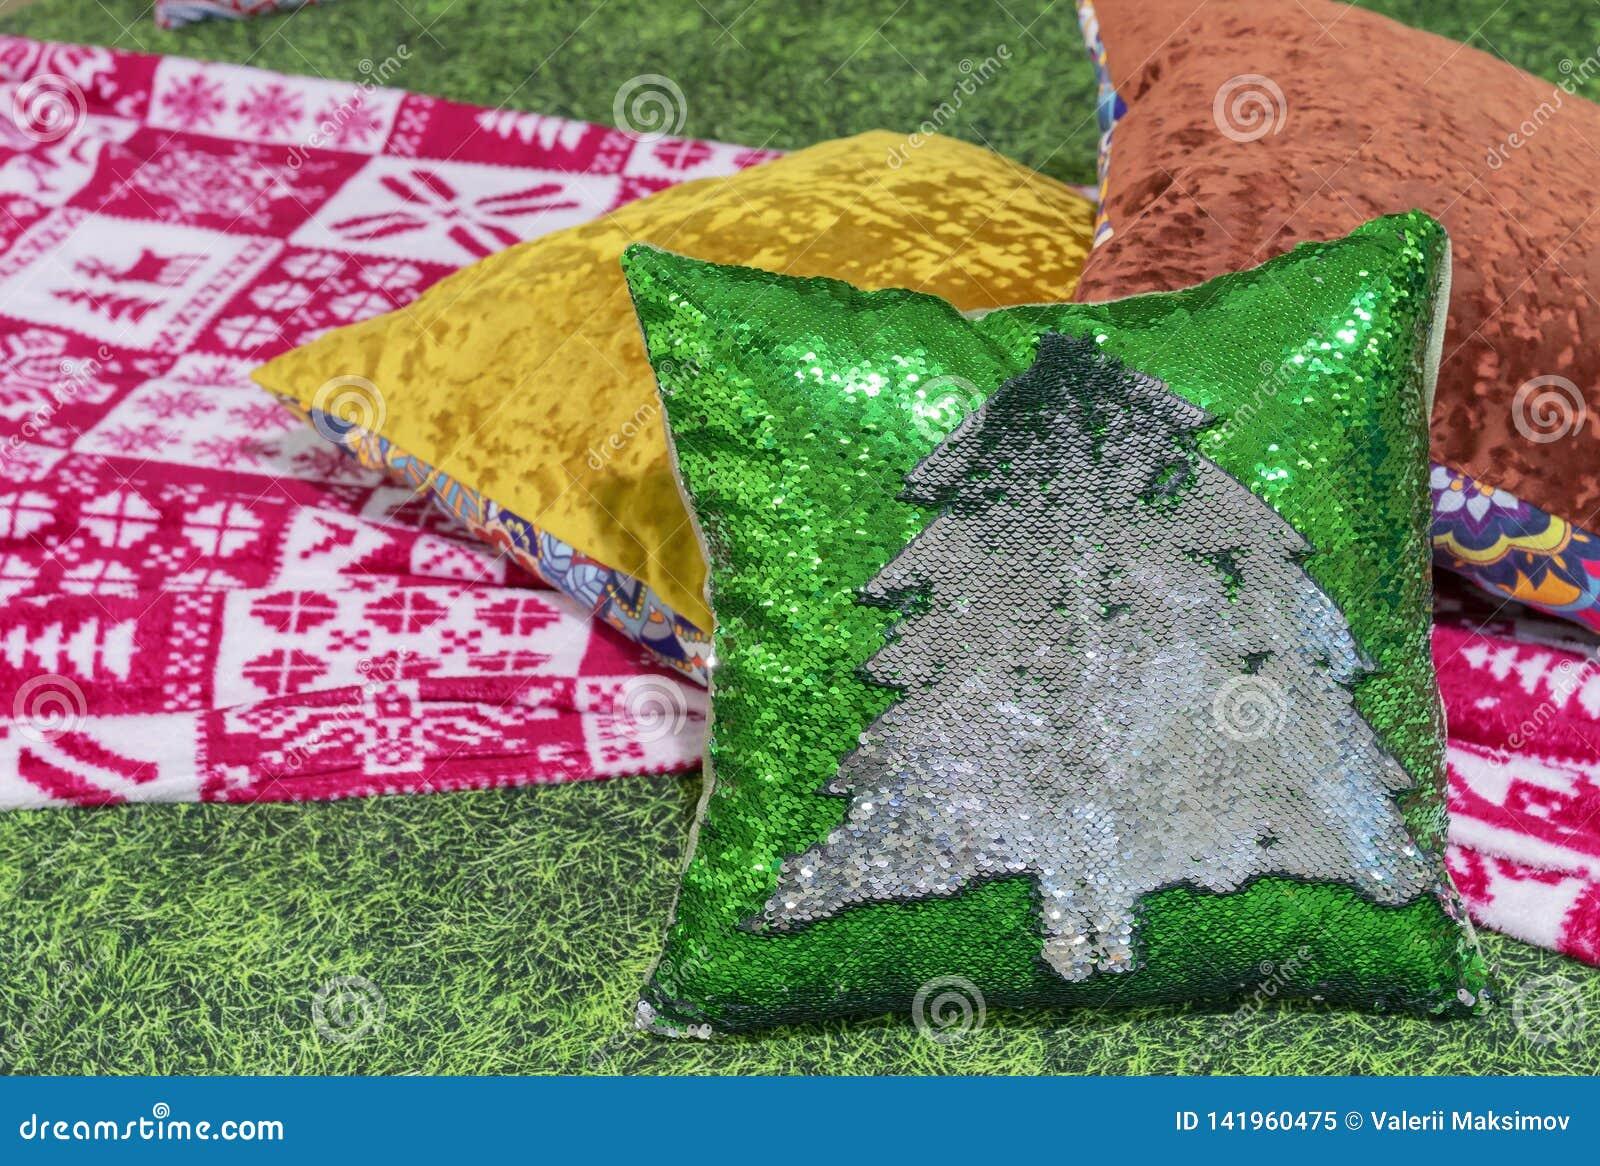 Descanso decorativo com a árvore de Natal das lantejoulas